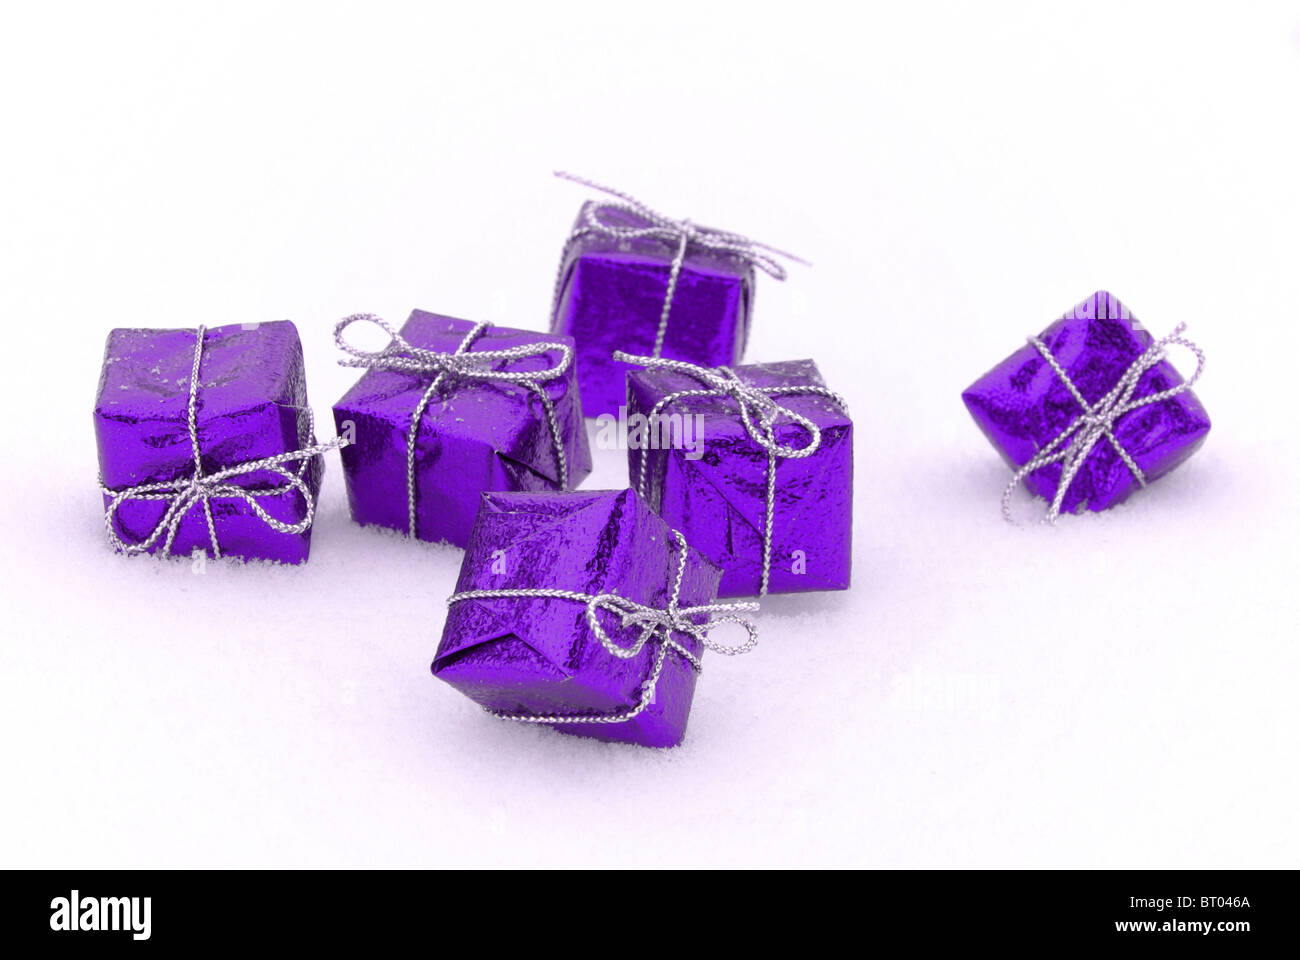 Geschenk im Schnee - gift in snow 04 - Stock Image